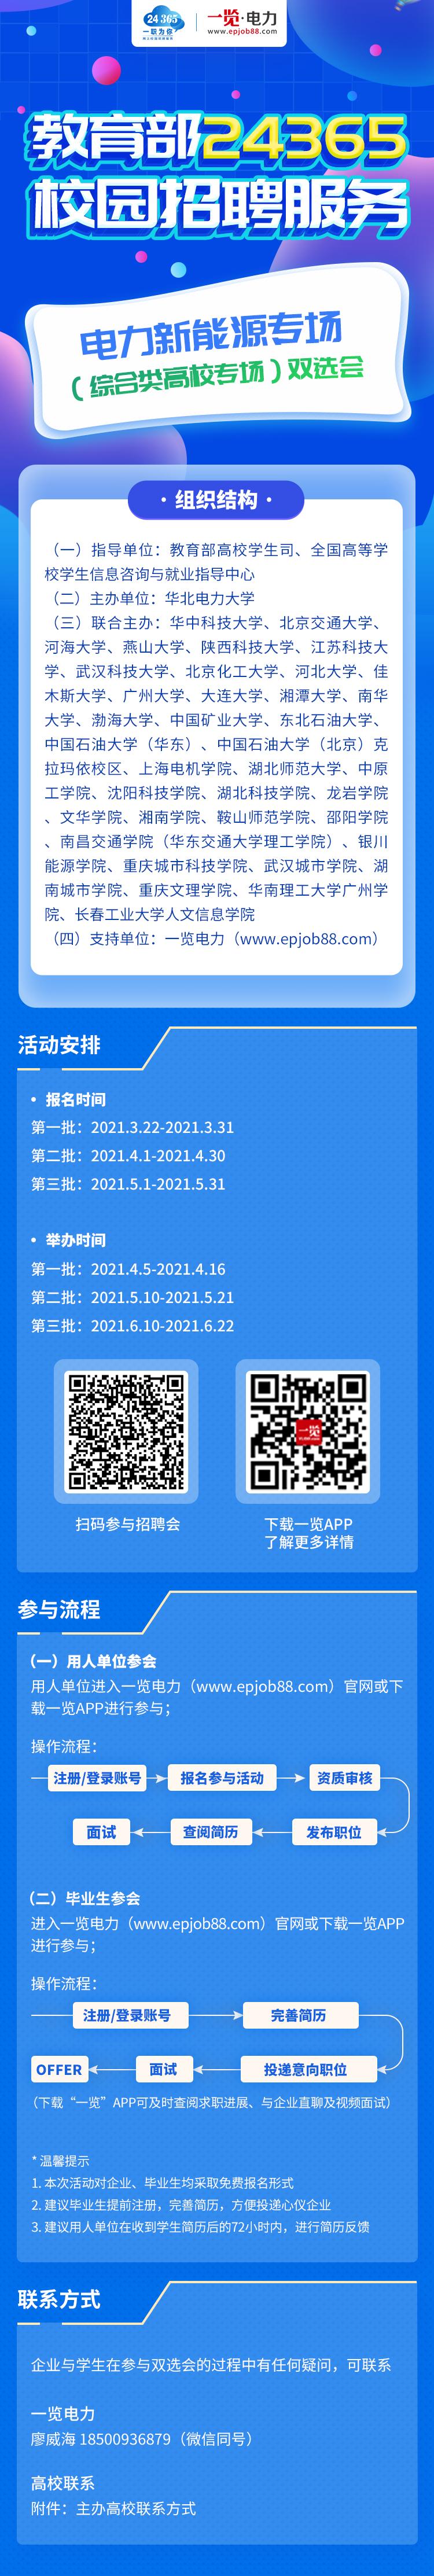 1617185835-A1USXG6.jpg